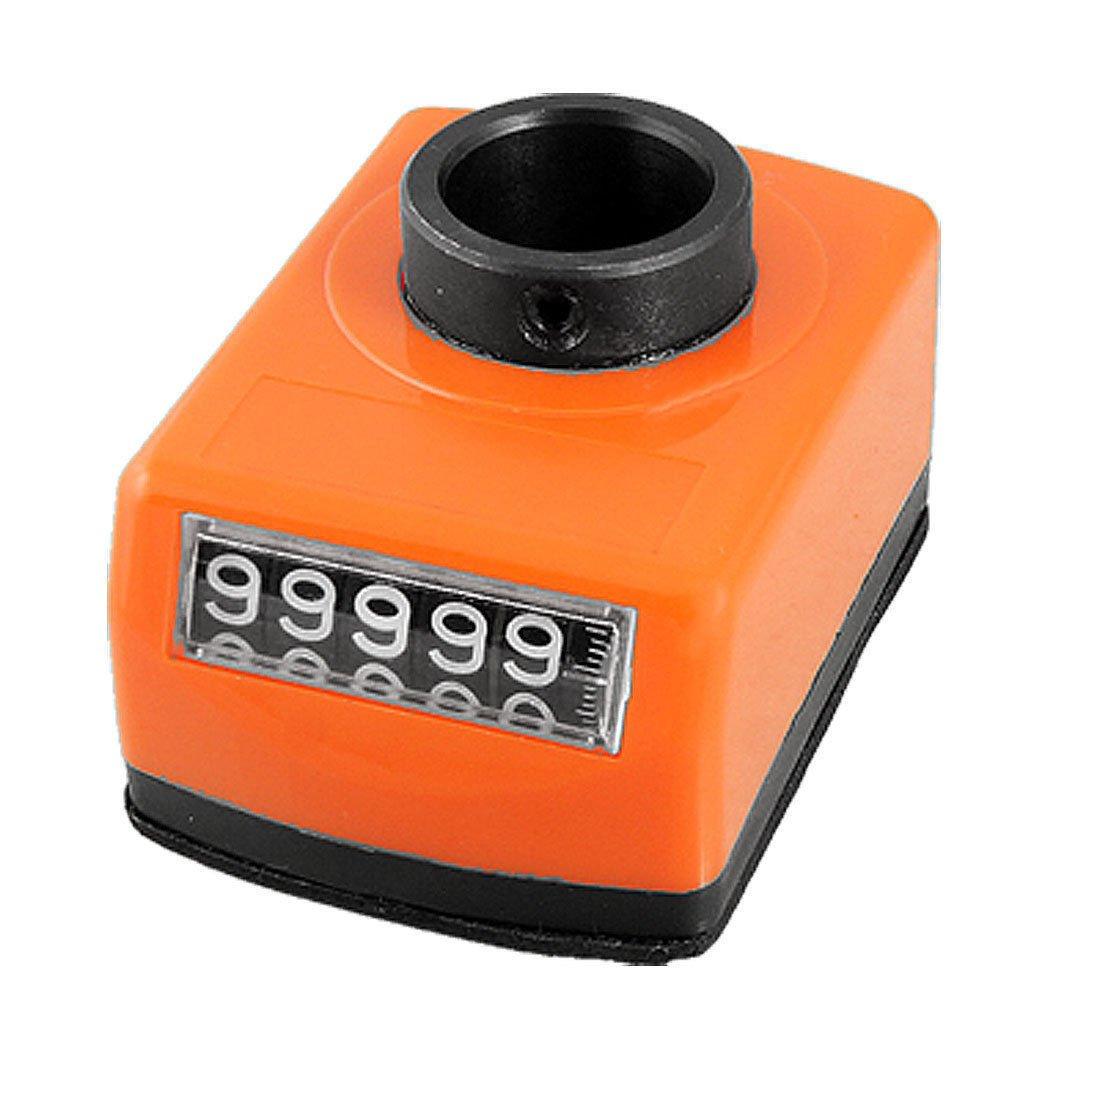 2.0mm Axial Pitch Orange Plastic Housing 0-99999 Range Digital Indicator